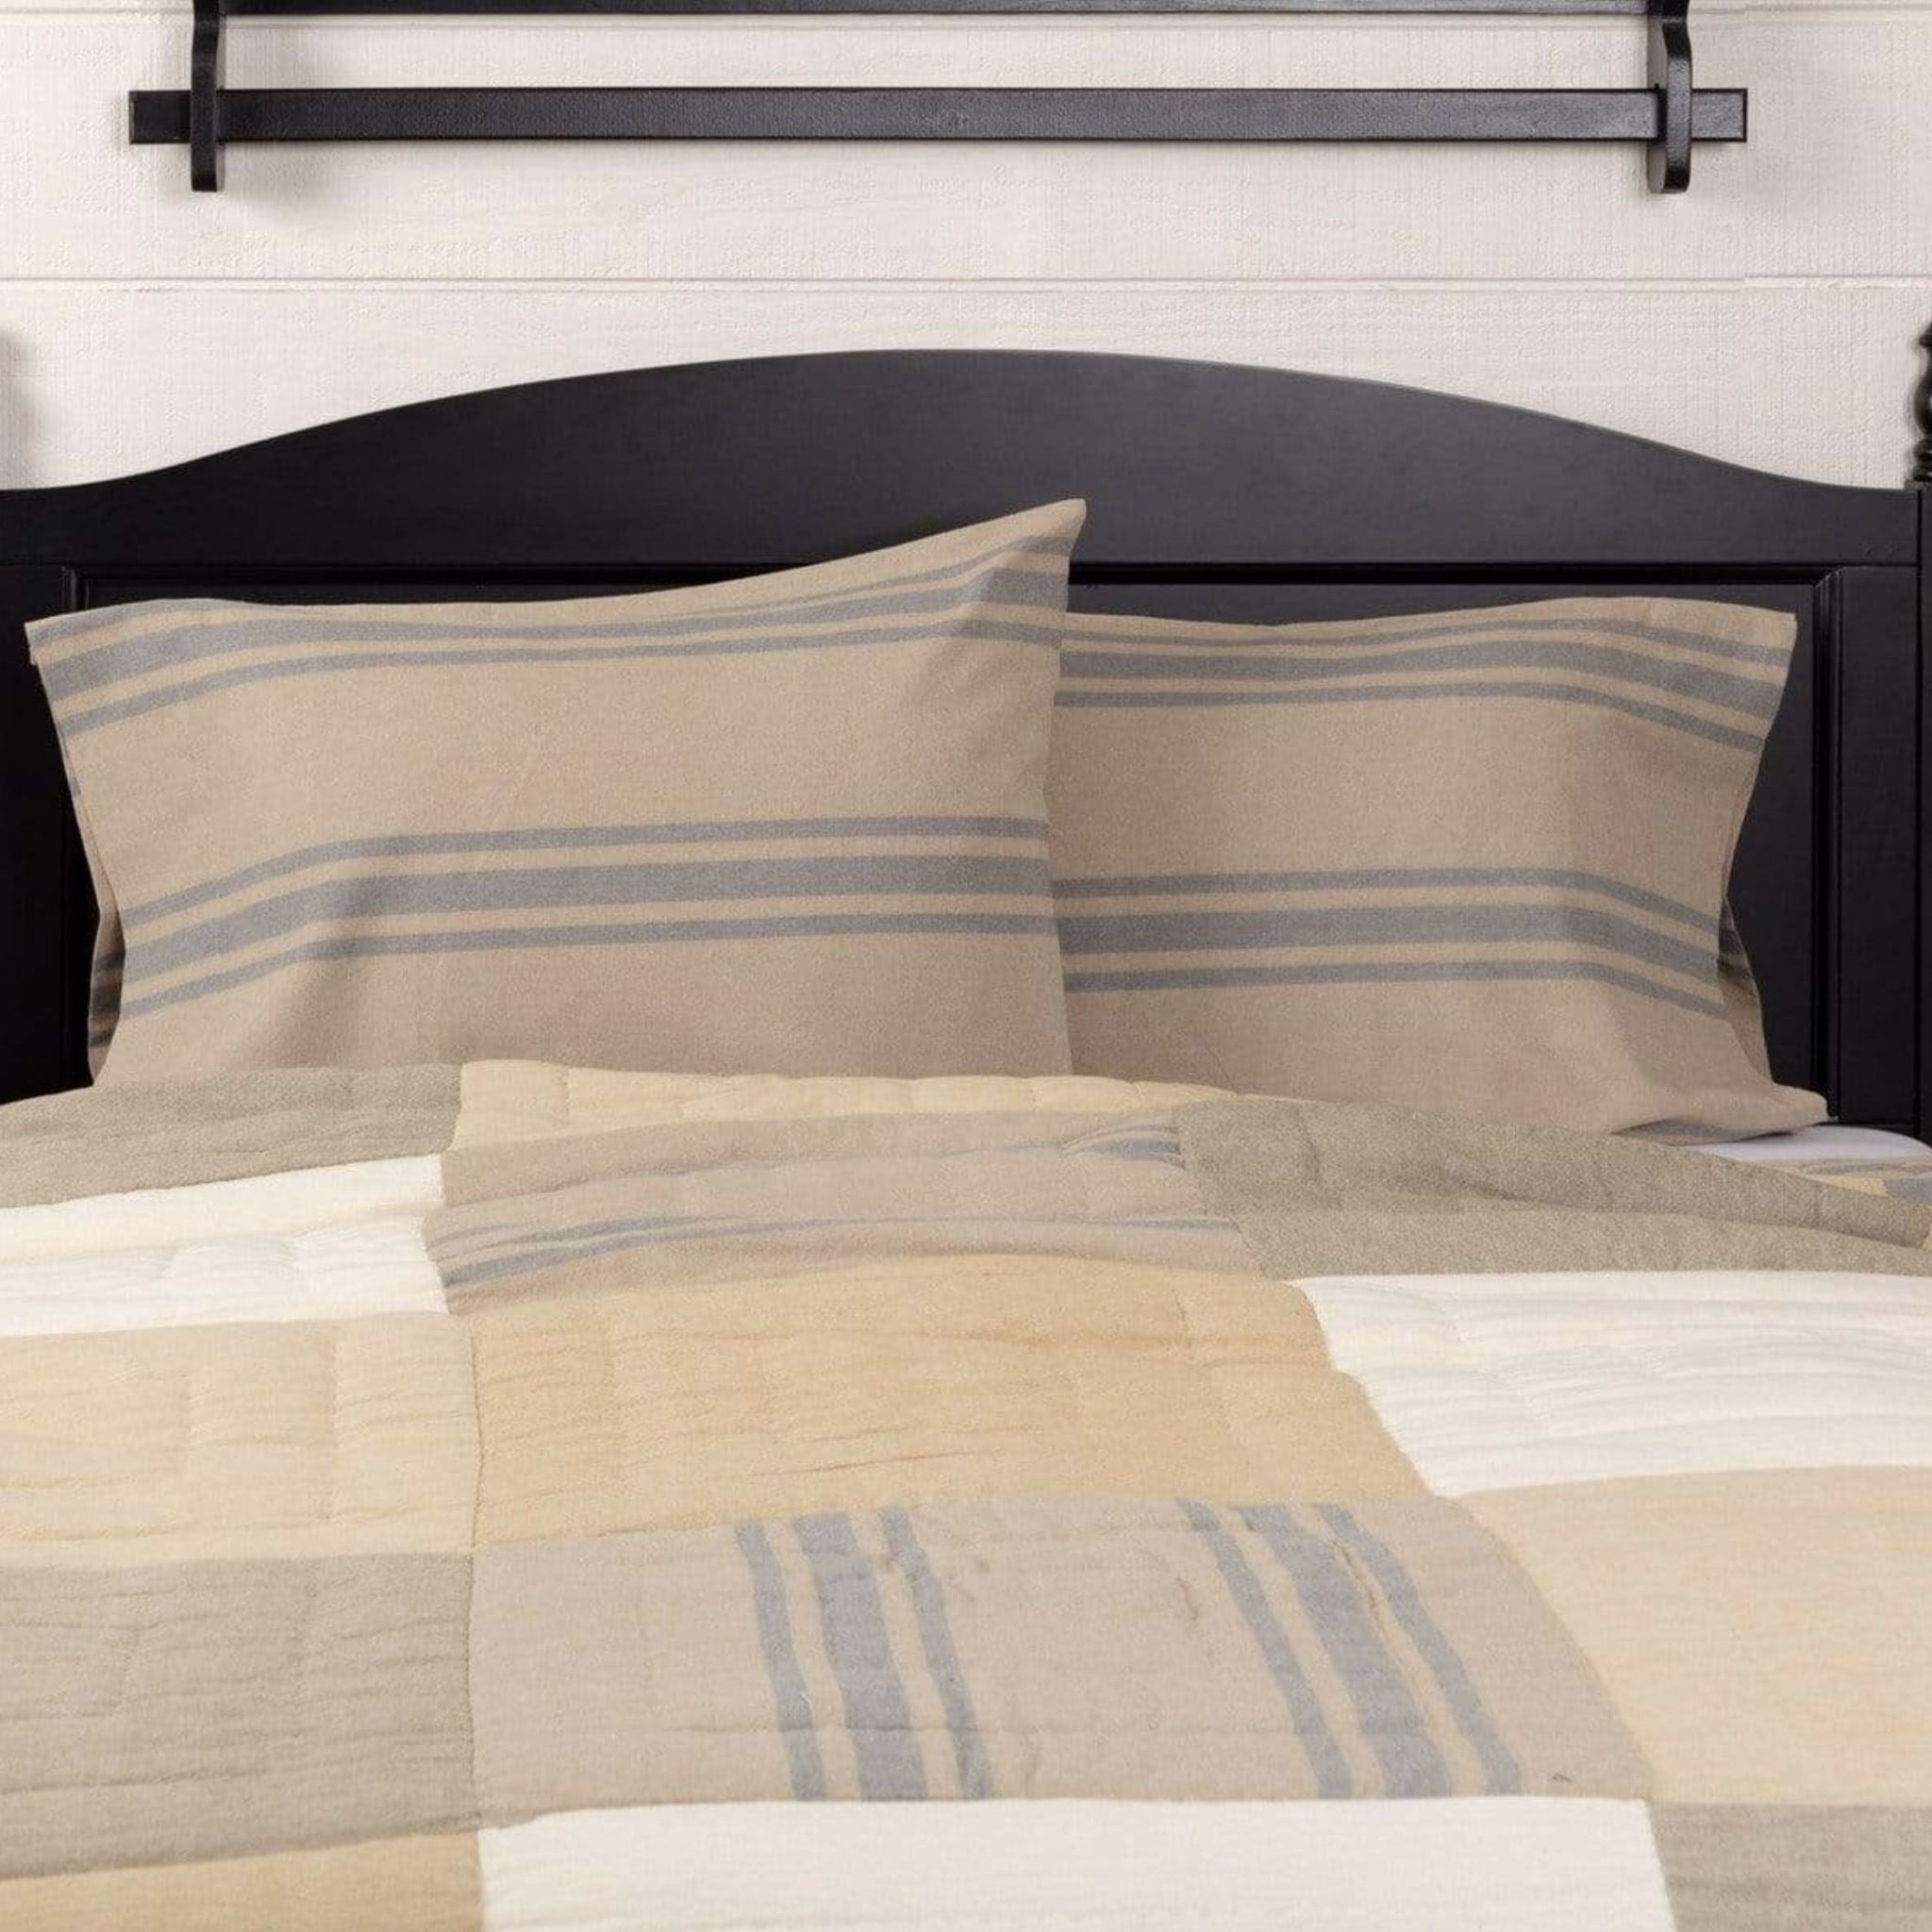 VHC Brands Farmers Market Grain Sack Stripe Pillow Case Set of 2